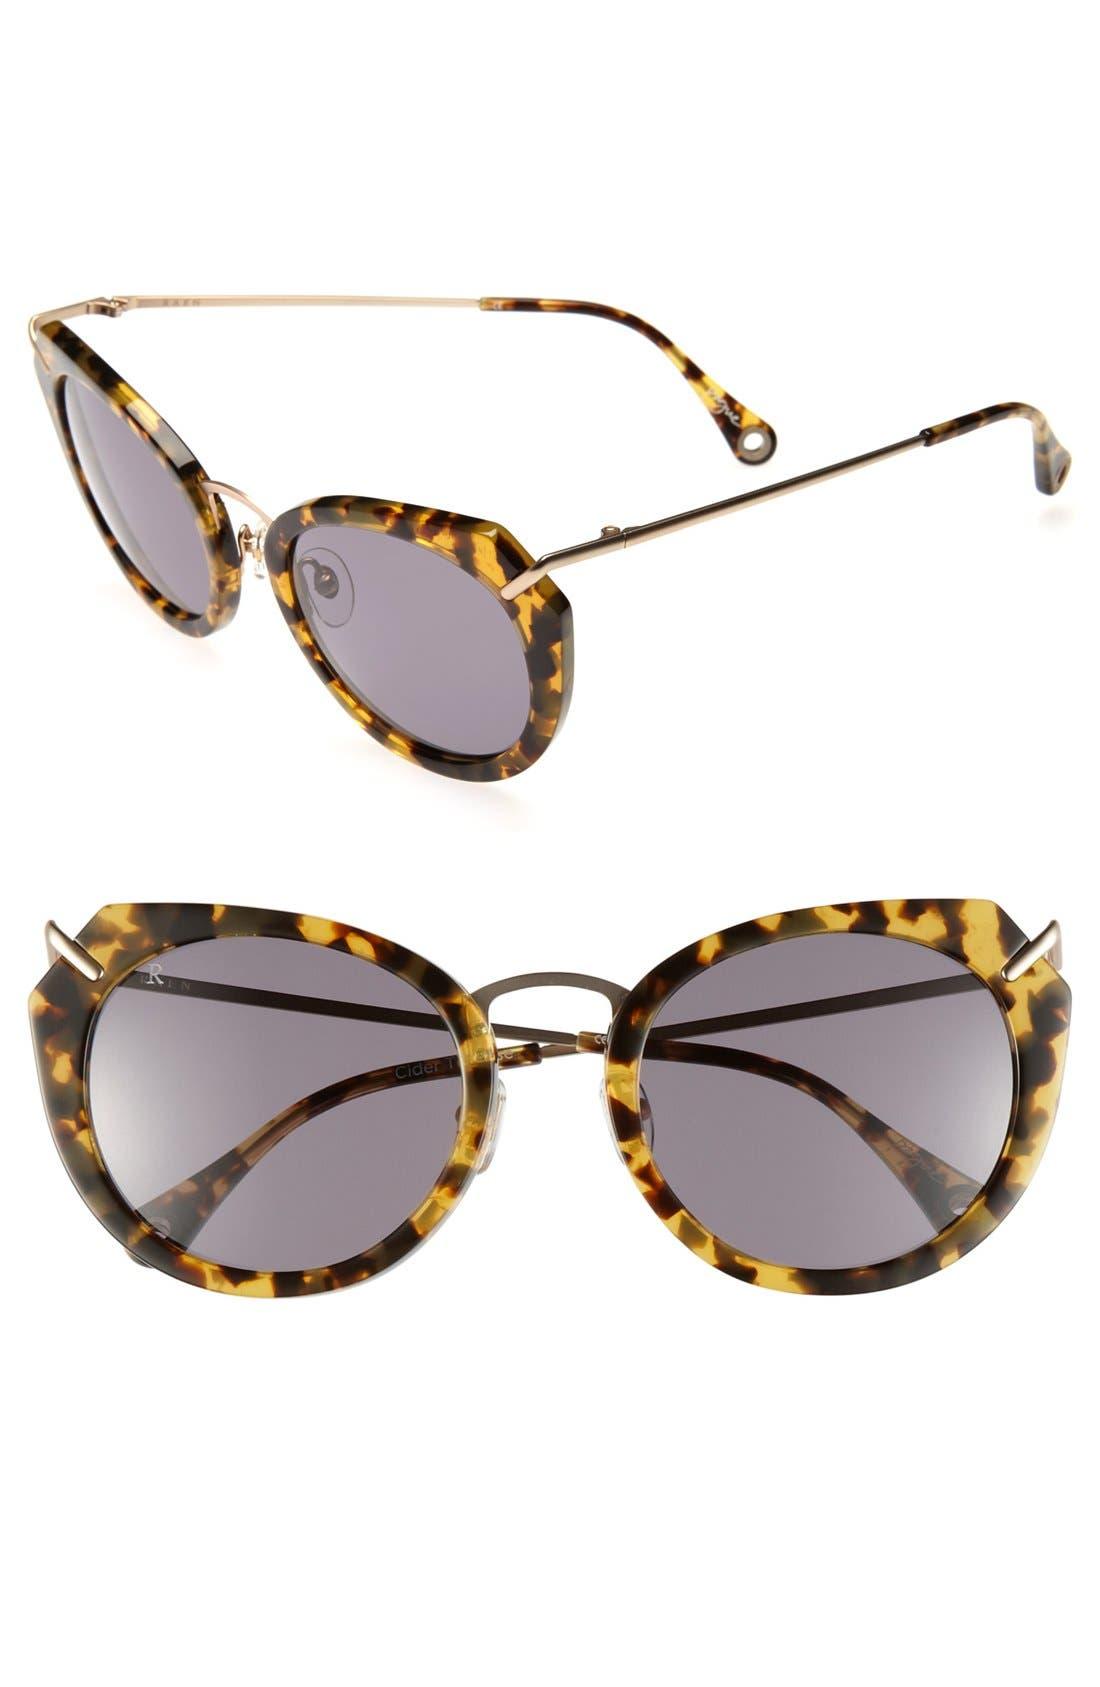 Main Image - RAEN 'Pogue' 53mm Sunglasses